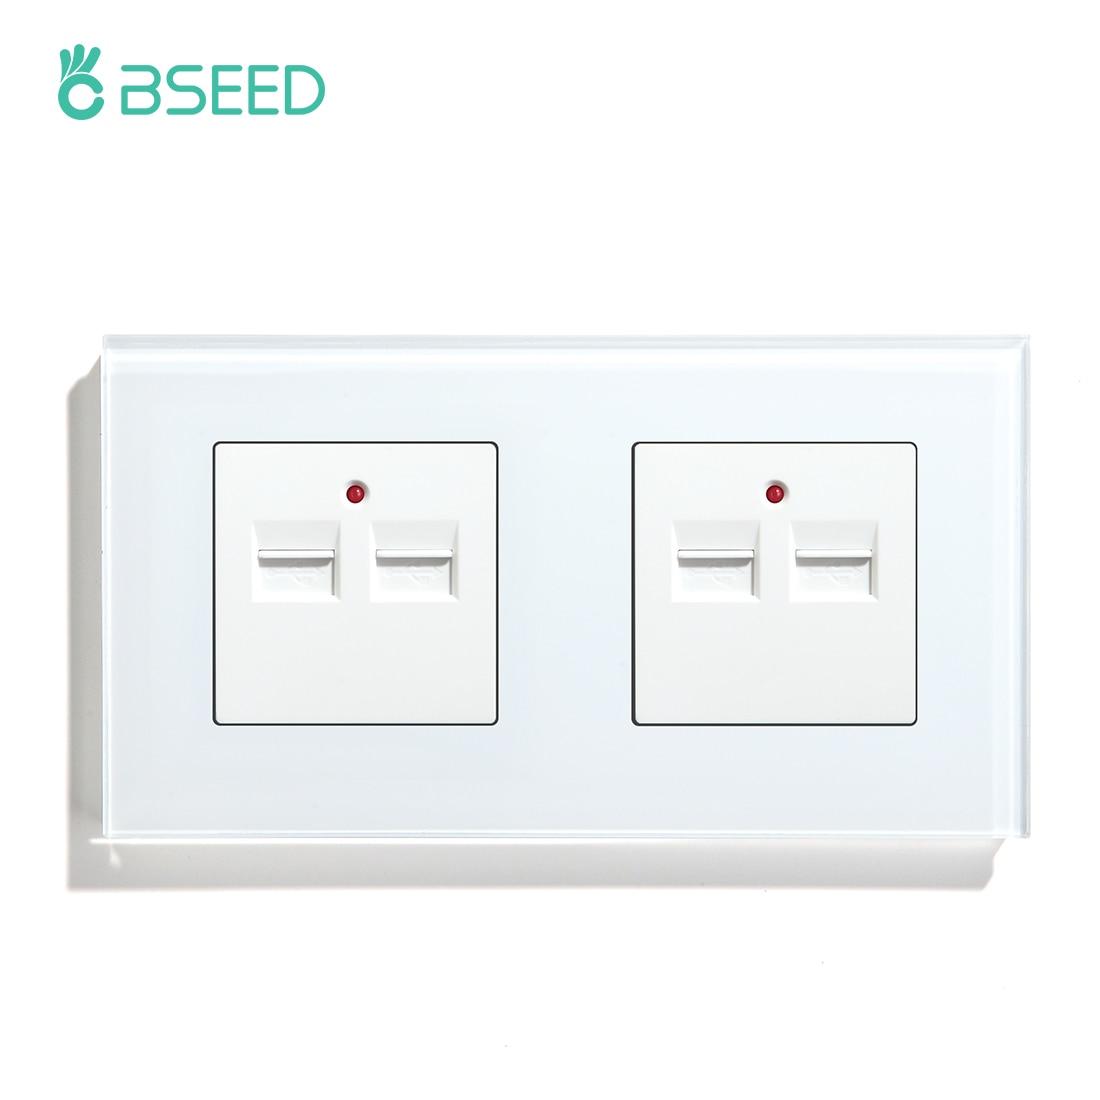 BSEED-مقبس حائط USB مزدوج ، قابس قياسي أوروبي 5 فولت 3.1 أمبير ، لوحة زجاجية كريستالية ، أبيض ، أسود